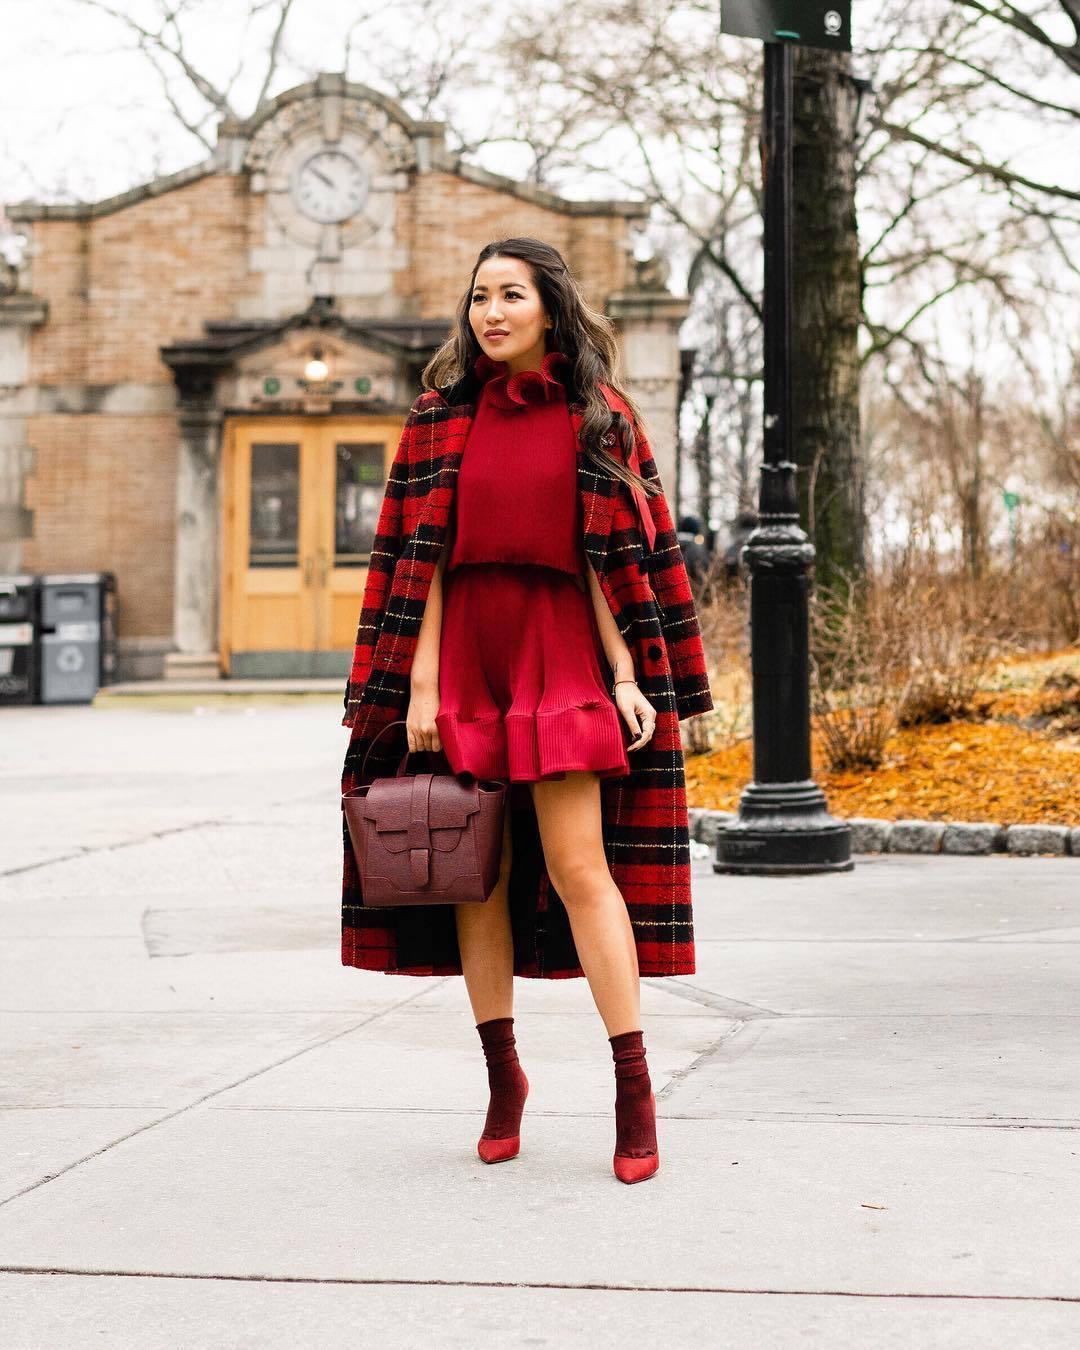 dress red dress mini dress pumps socks plaid red coat bag